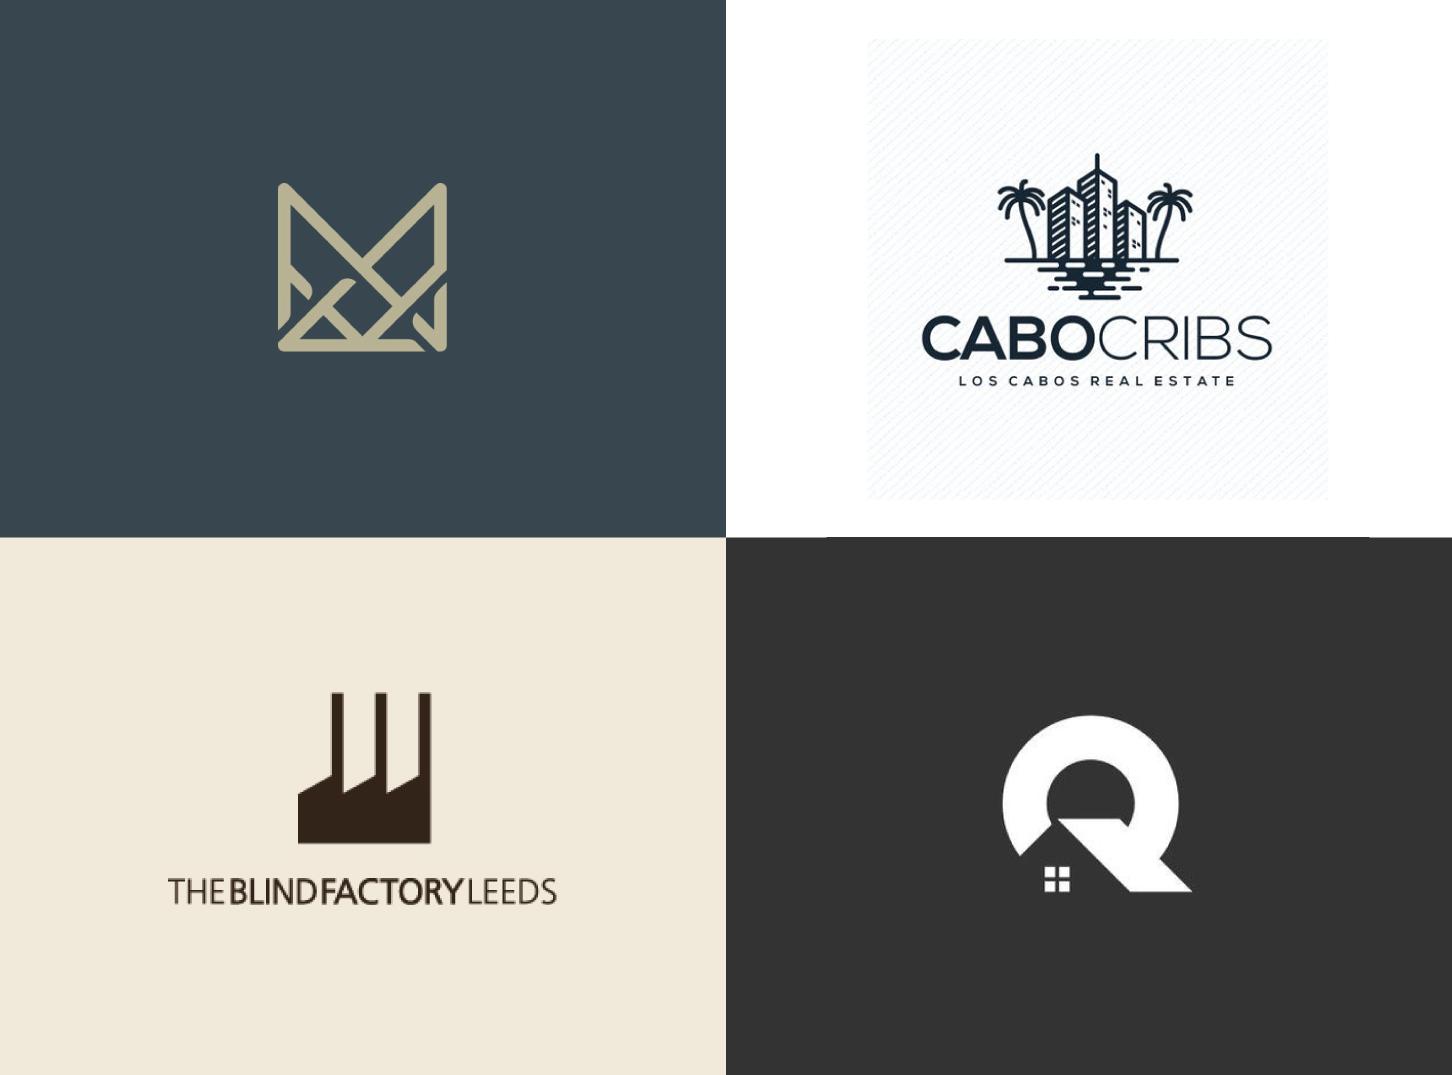 a collection of 4 real estate logo designs